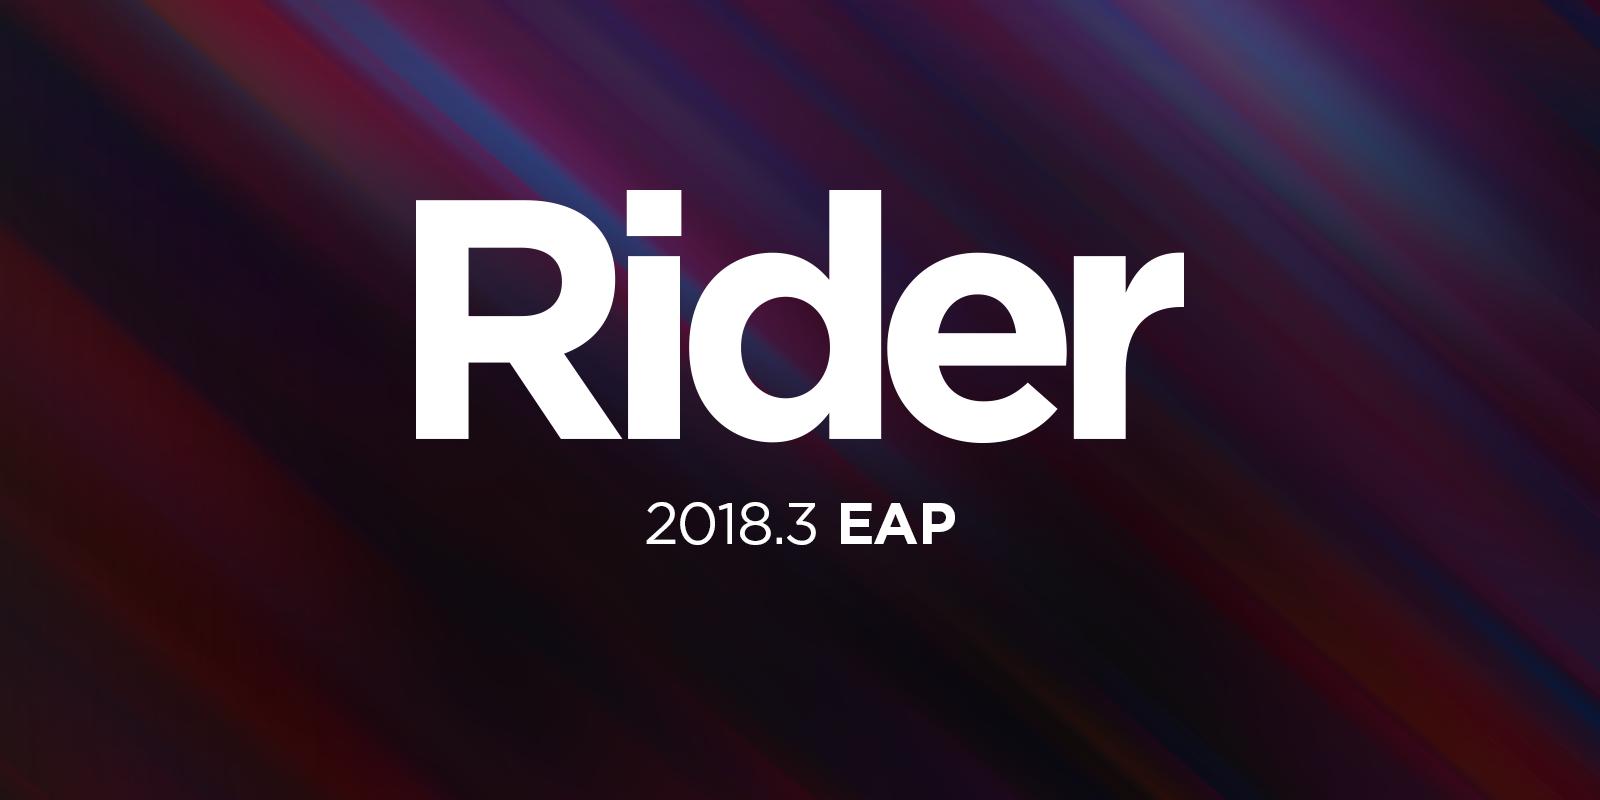 Rider 2018.3 EAP